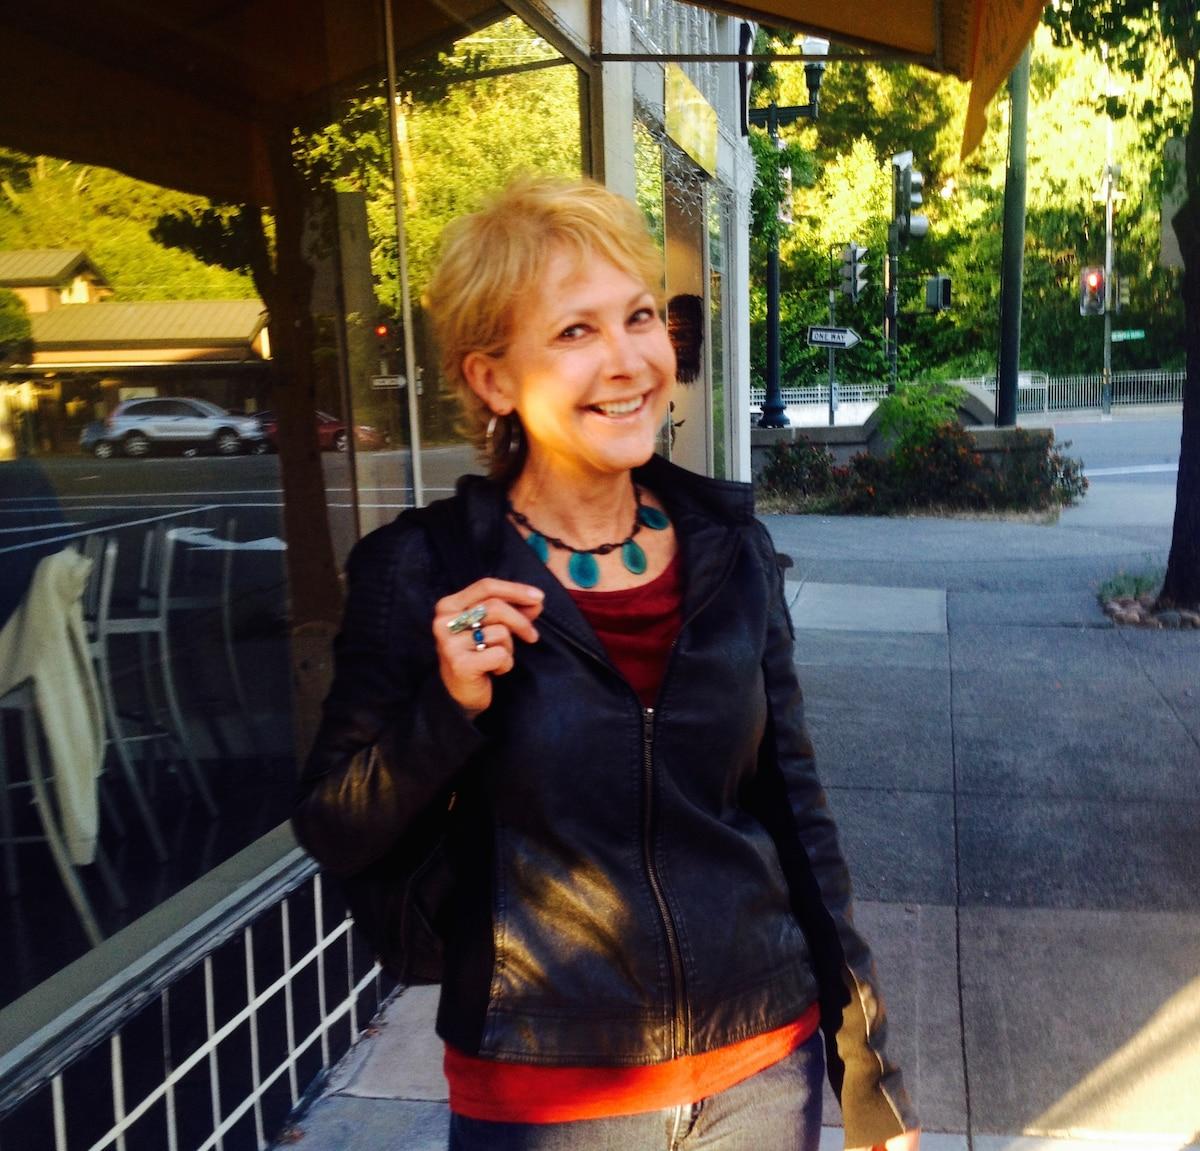 Patricia from Fairfax